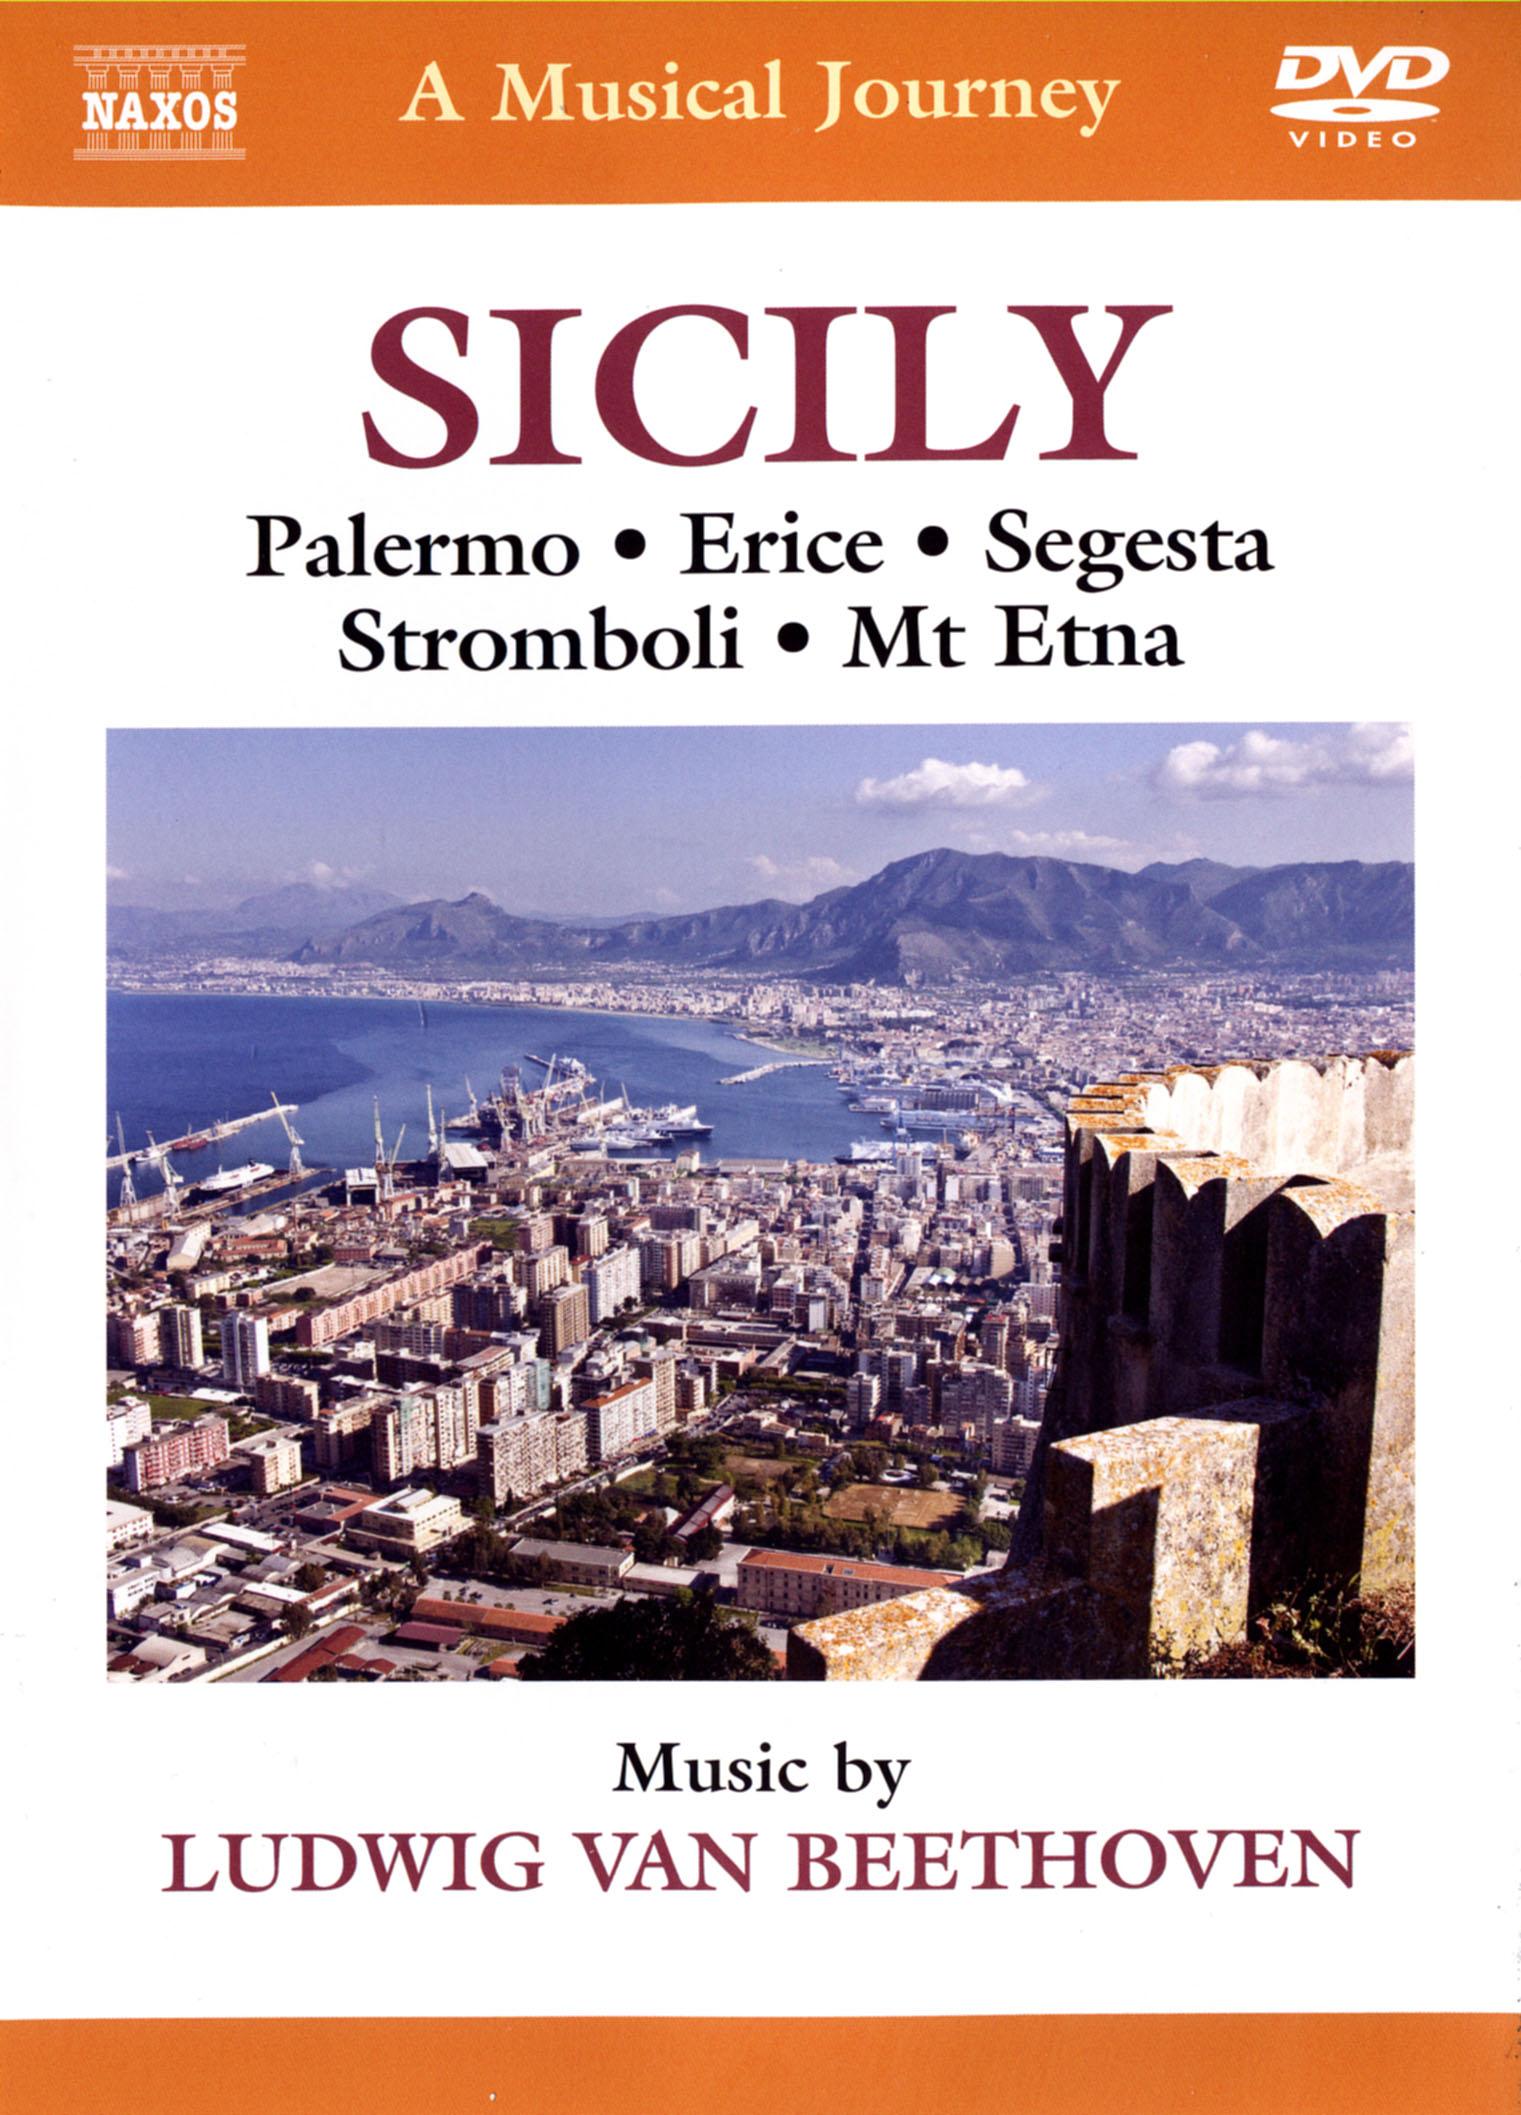 A Musical Journey: Sicily - Palermo/Erice/Segesta/Stromboli/Mt Etna